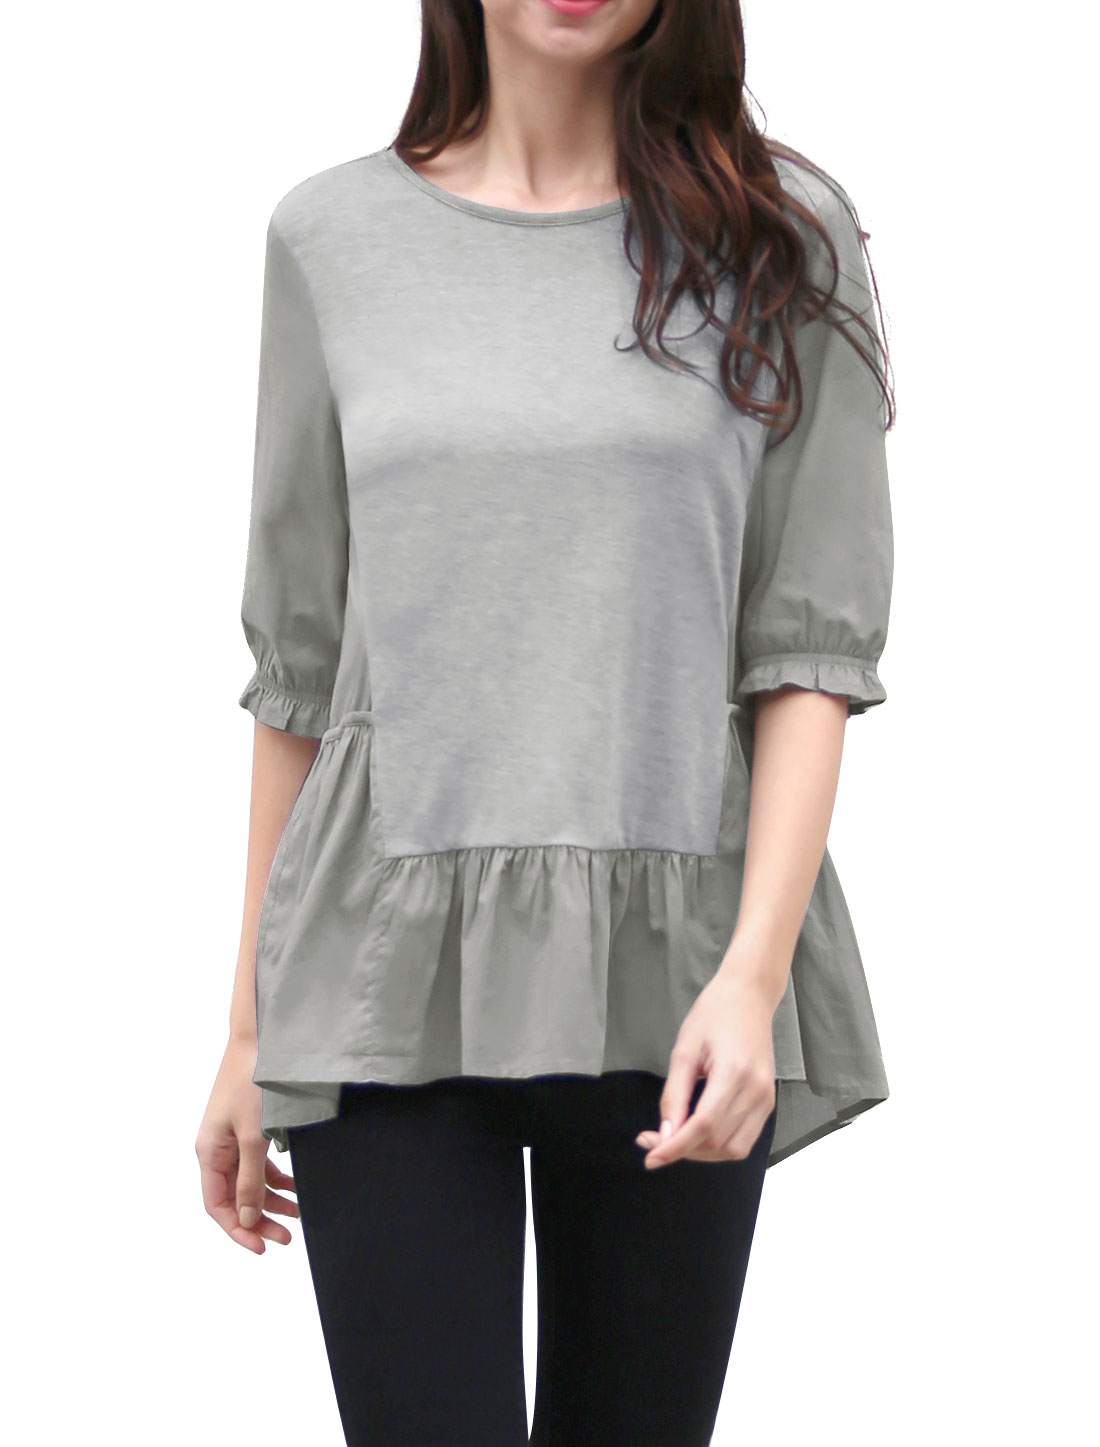 Women Ruffled High-Low Hem 1/2 Sleeves Paneled Tunic Top Gray M